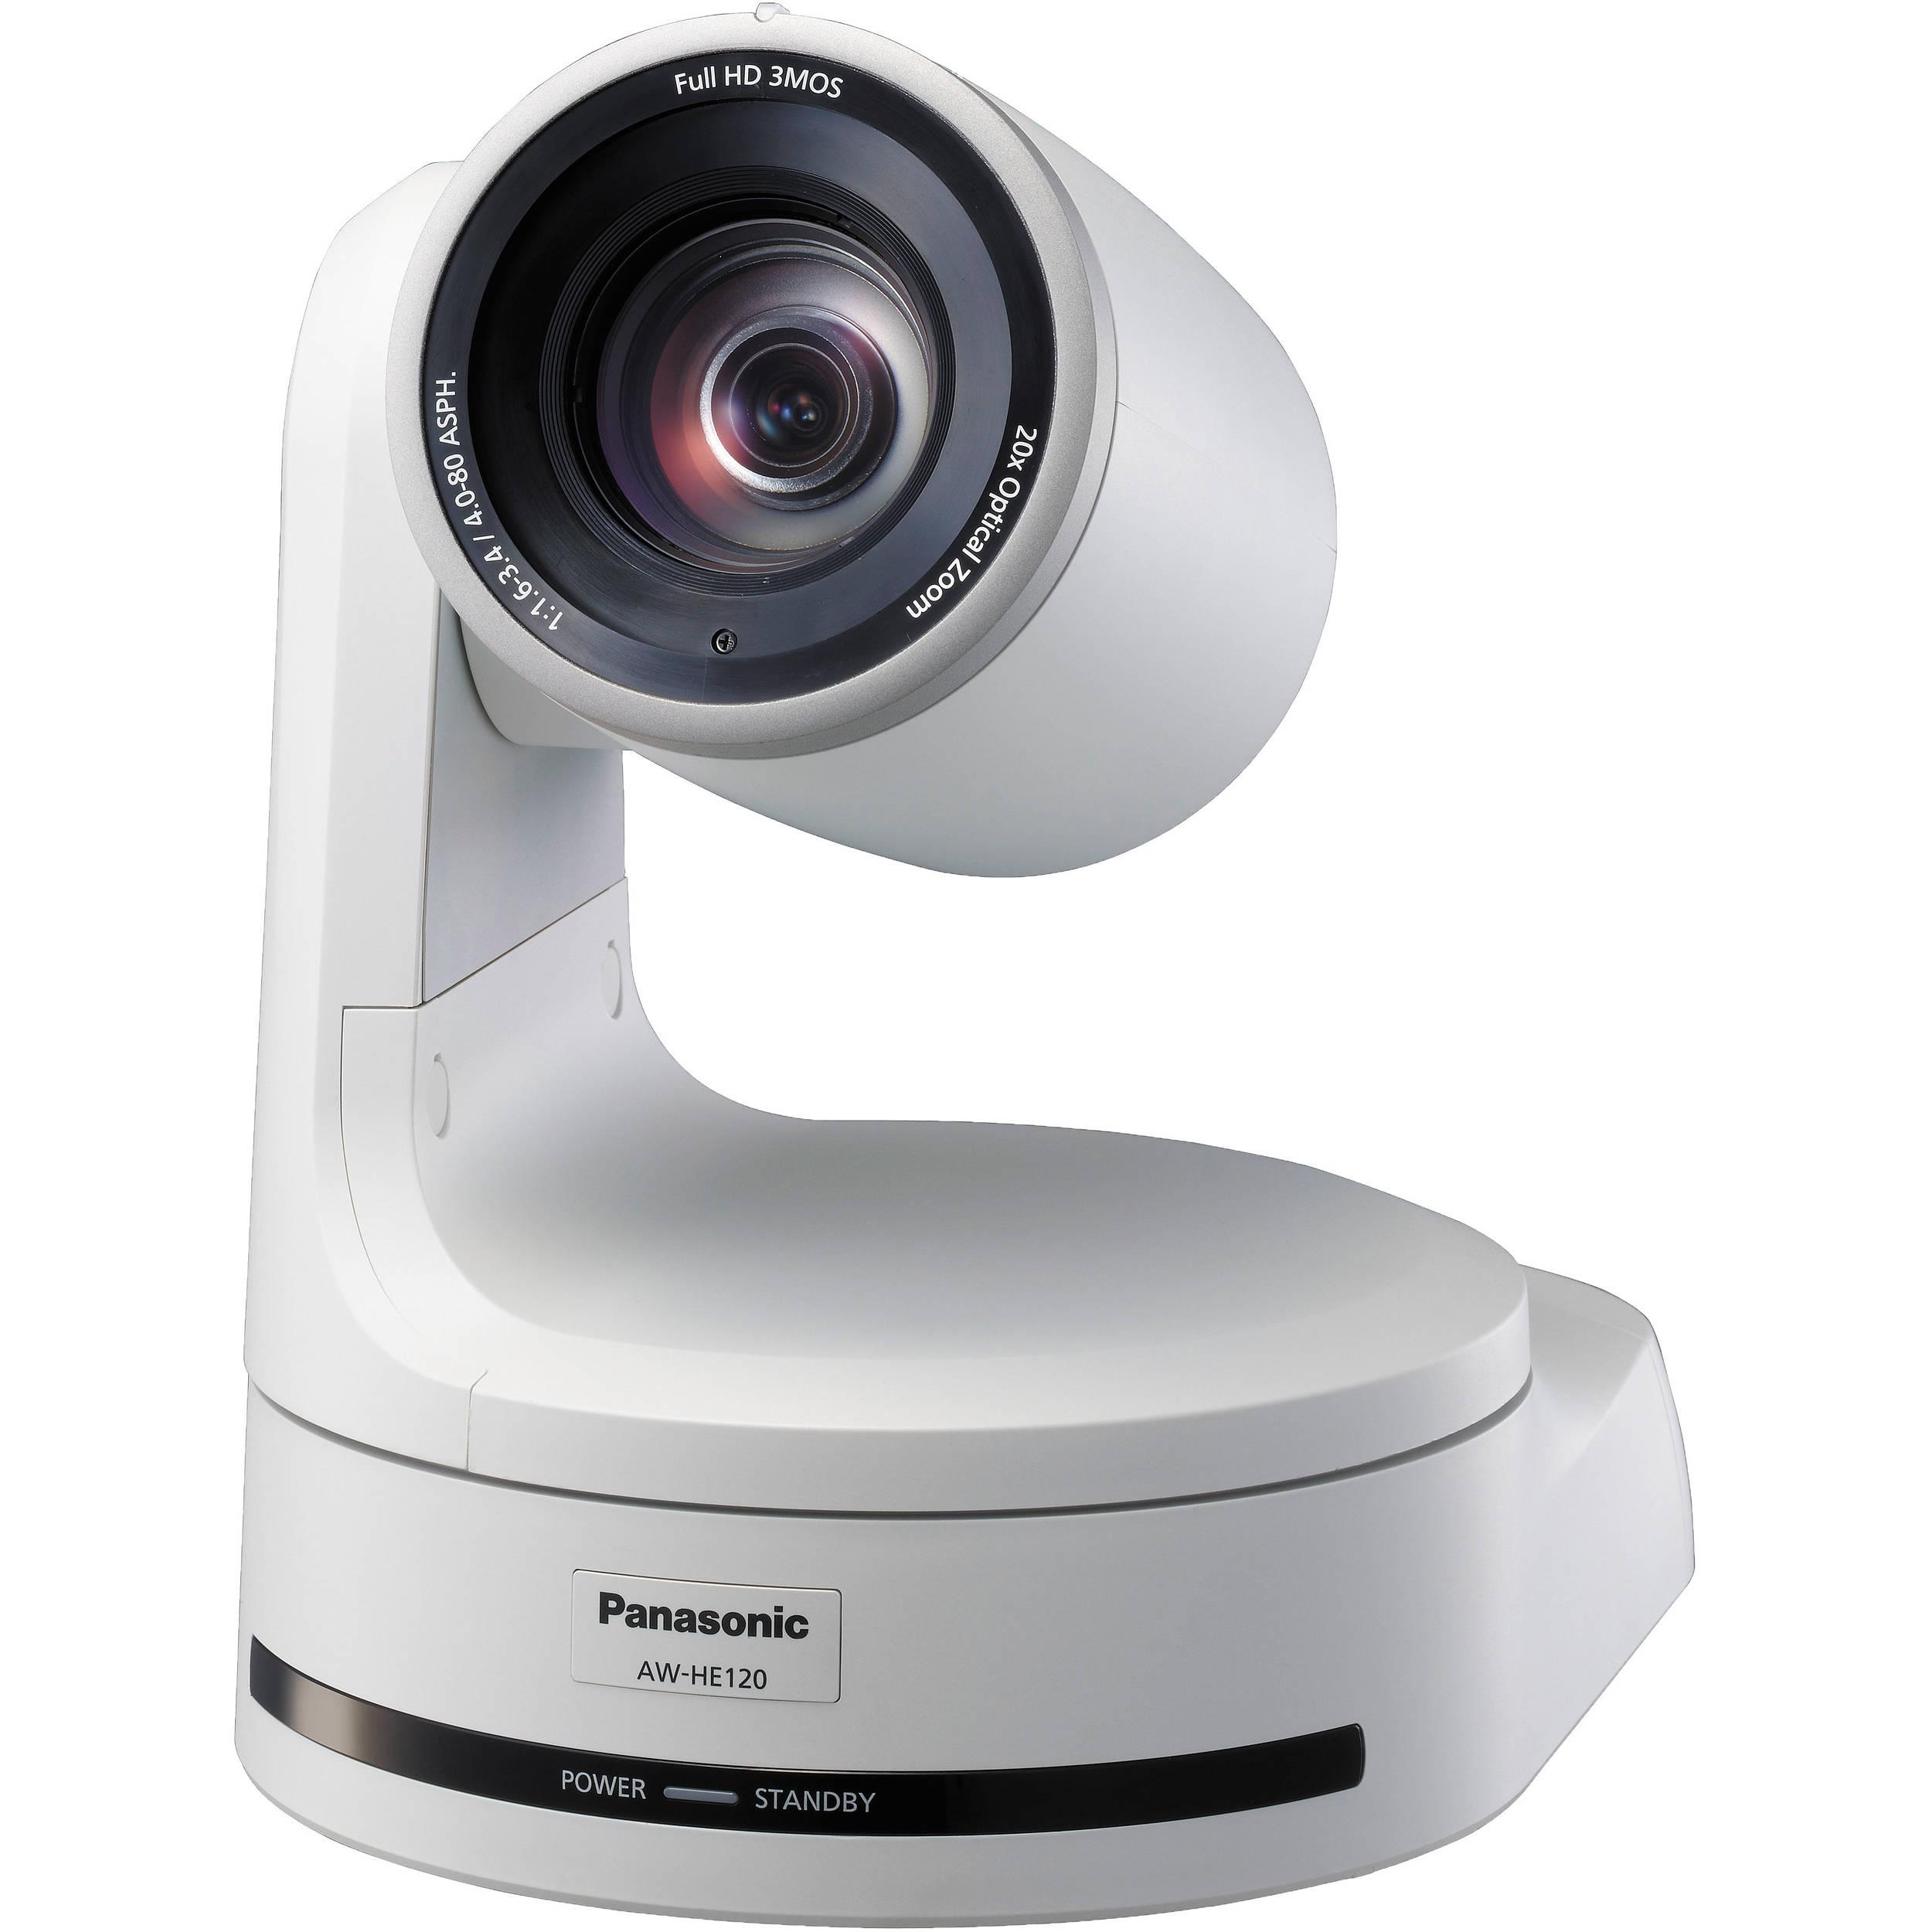 Ptz Camera Wiring Diagram Will Be A Thing Sensormatic Vaddio Panasonic Aw He120 White 999 6120 000w B H How To Pdf